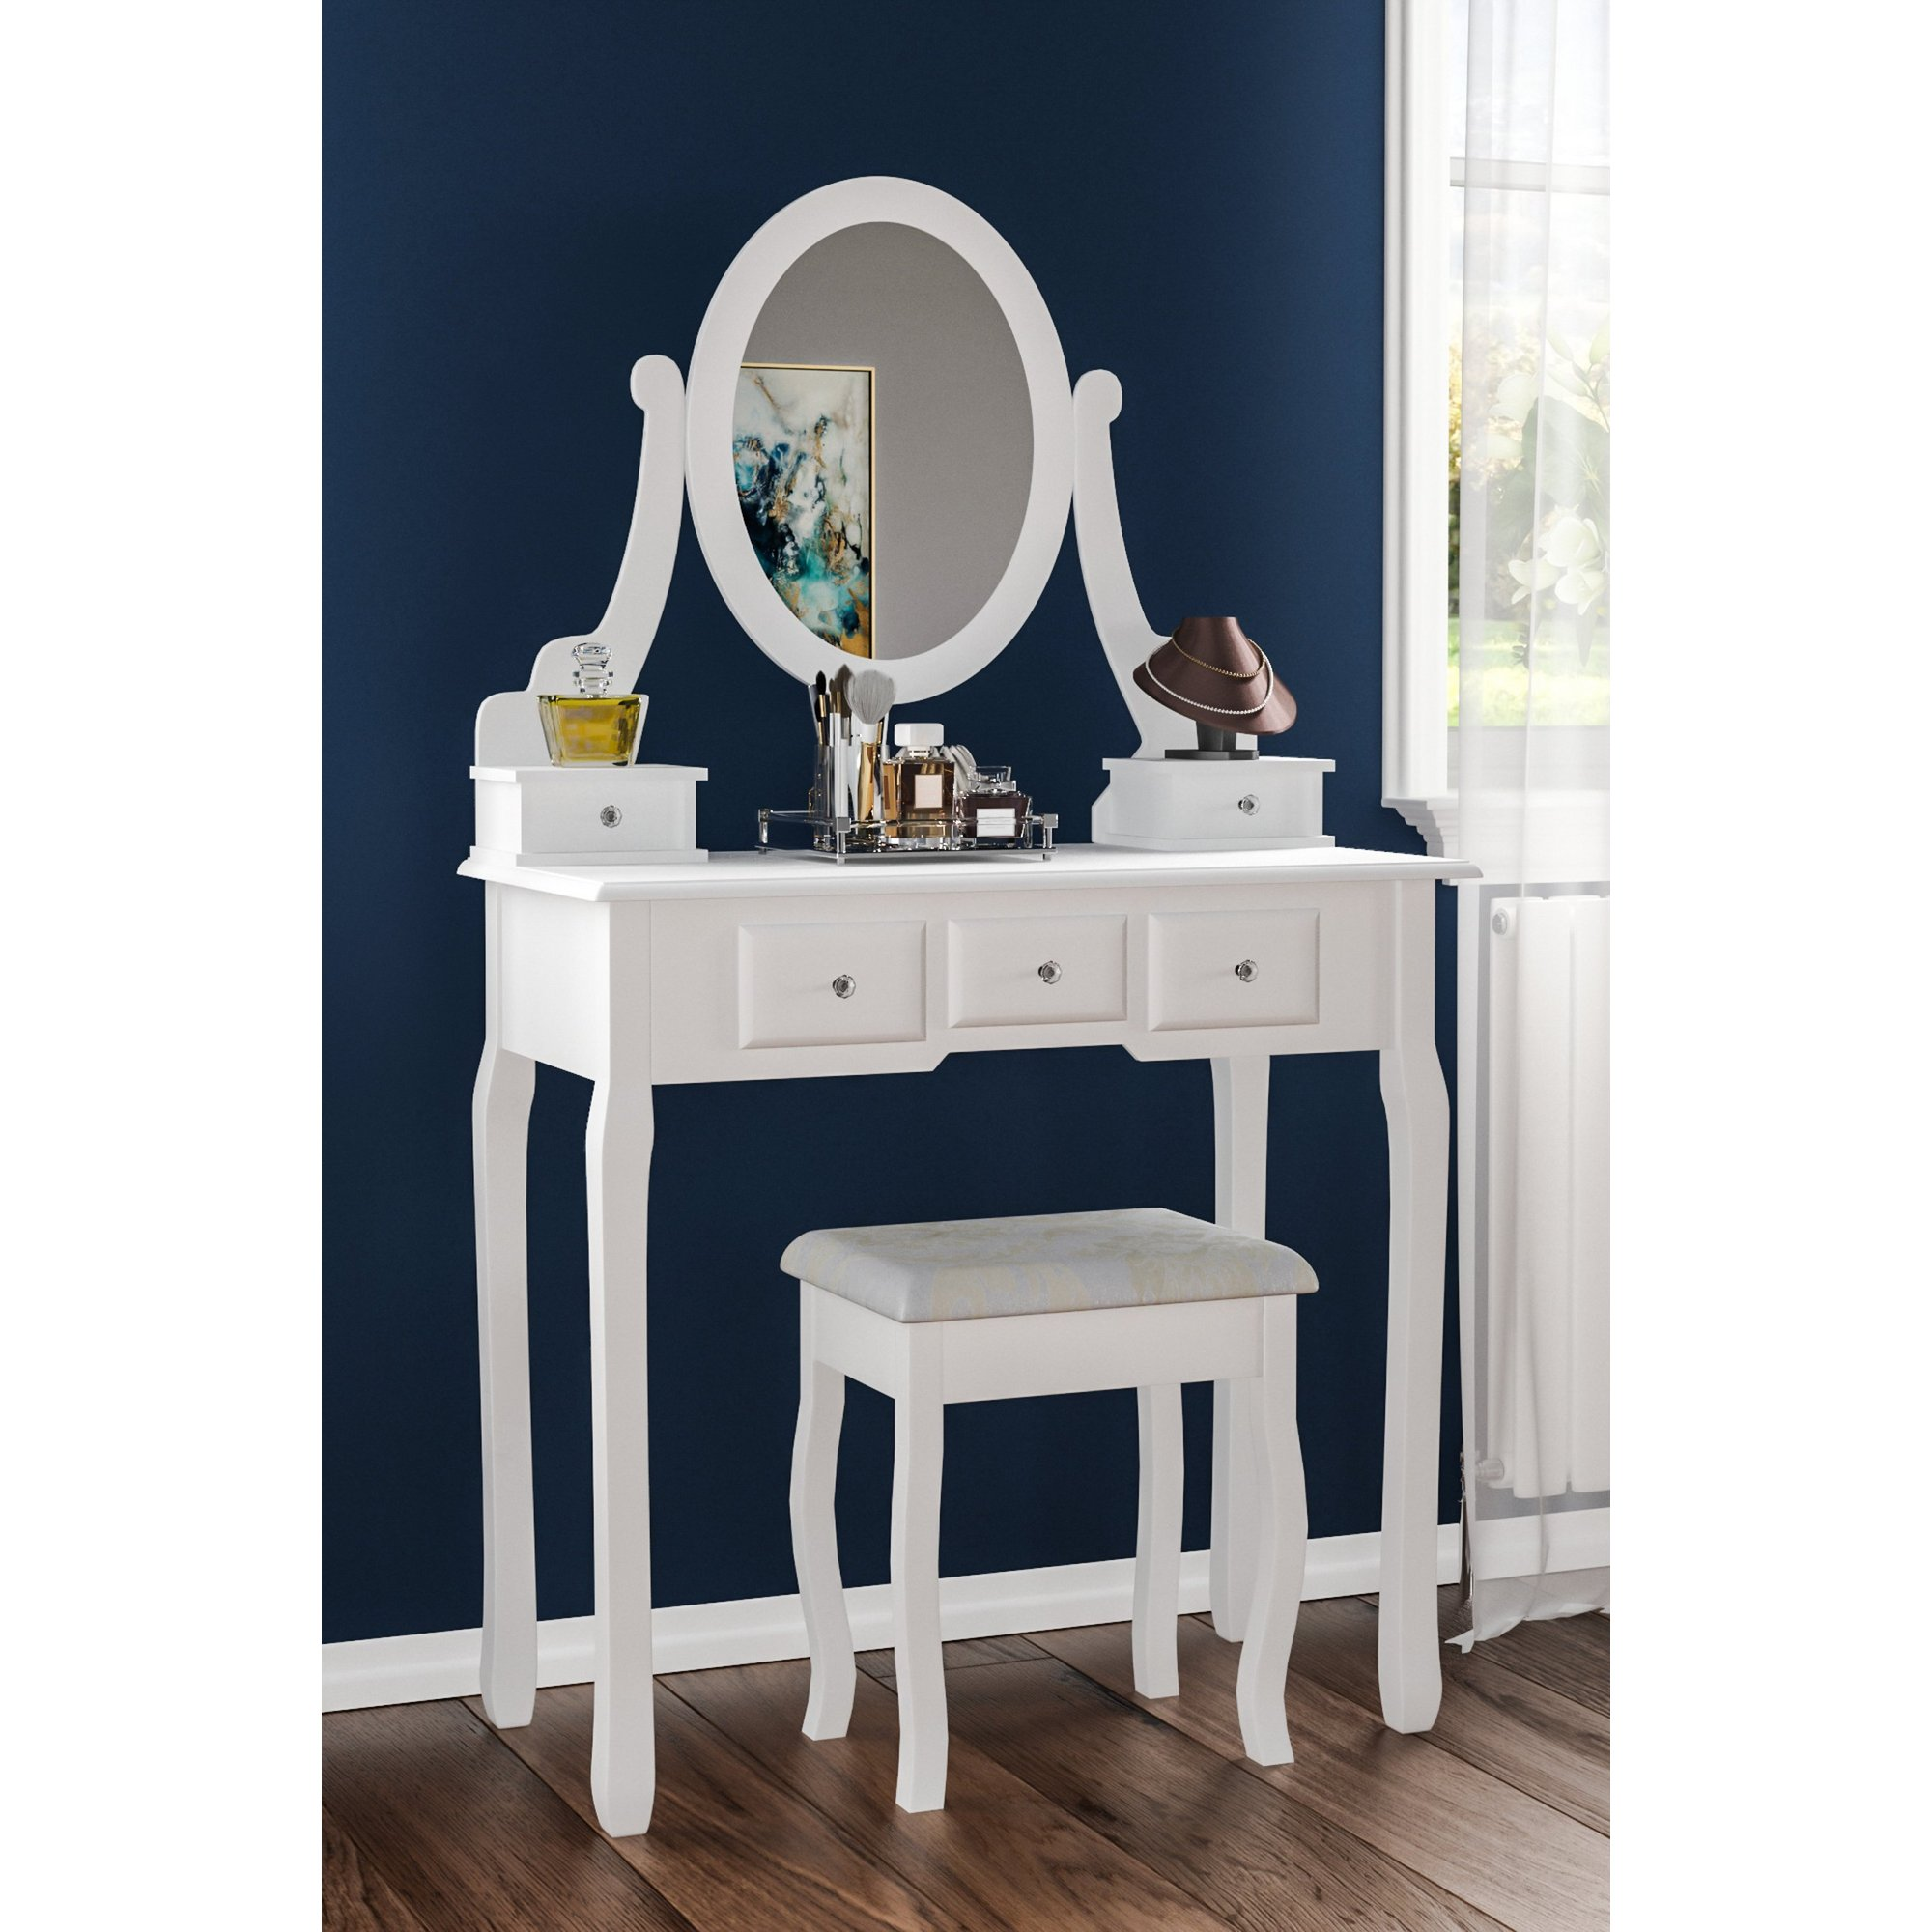 Image of 5 Drawer Dressing Table Set